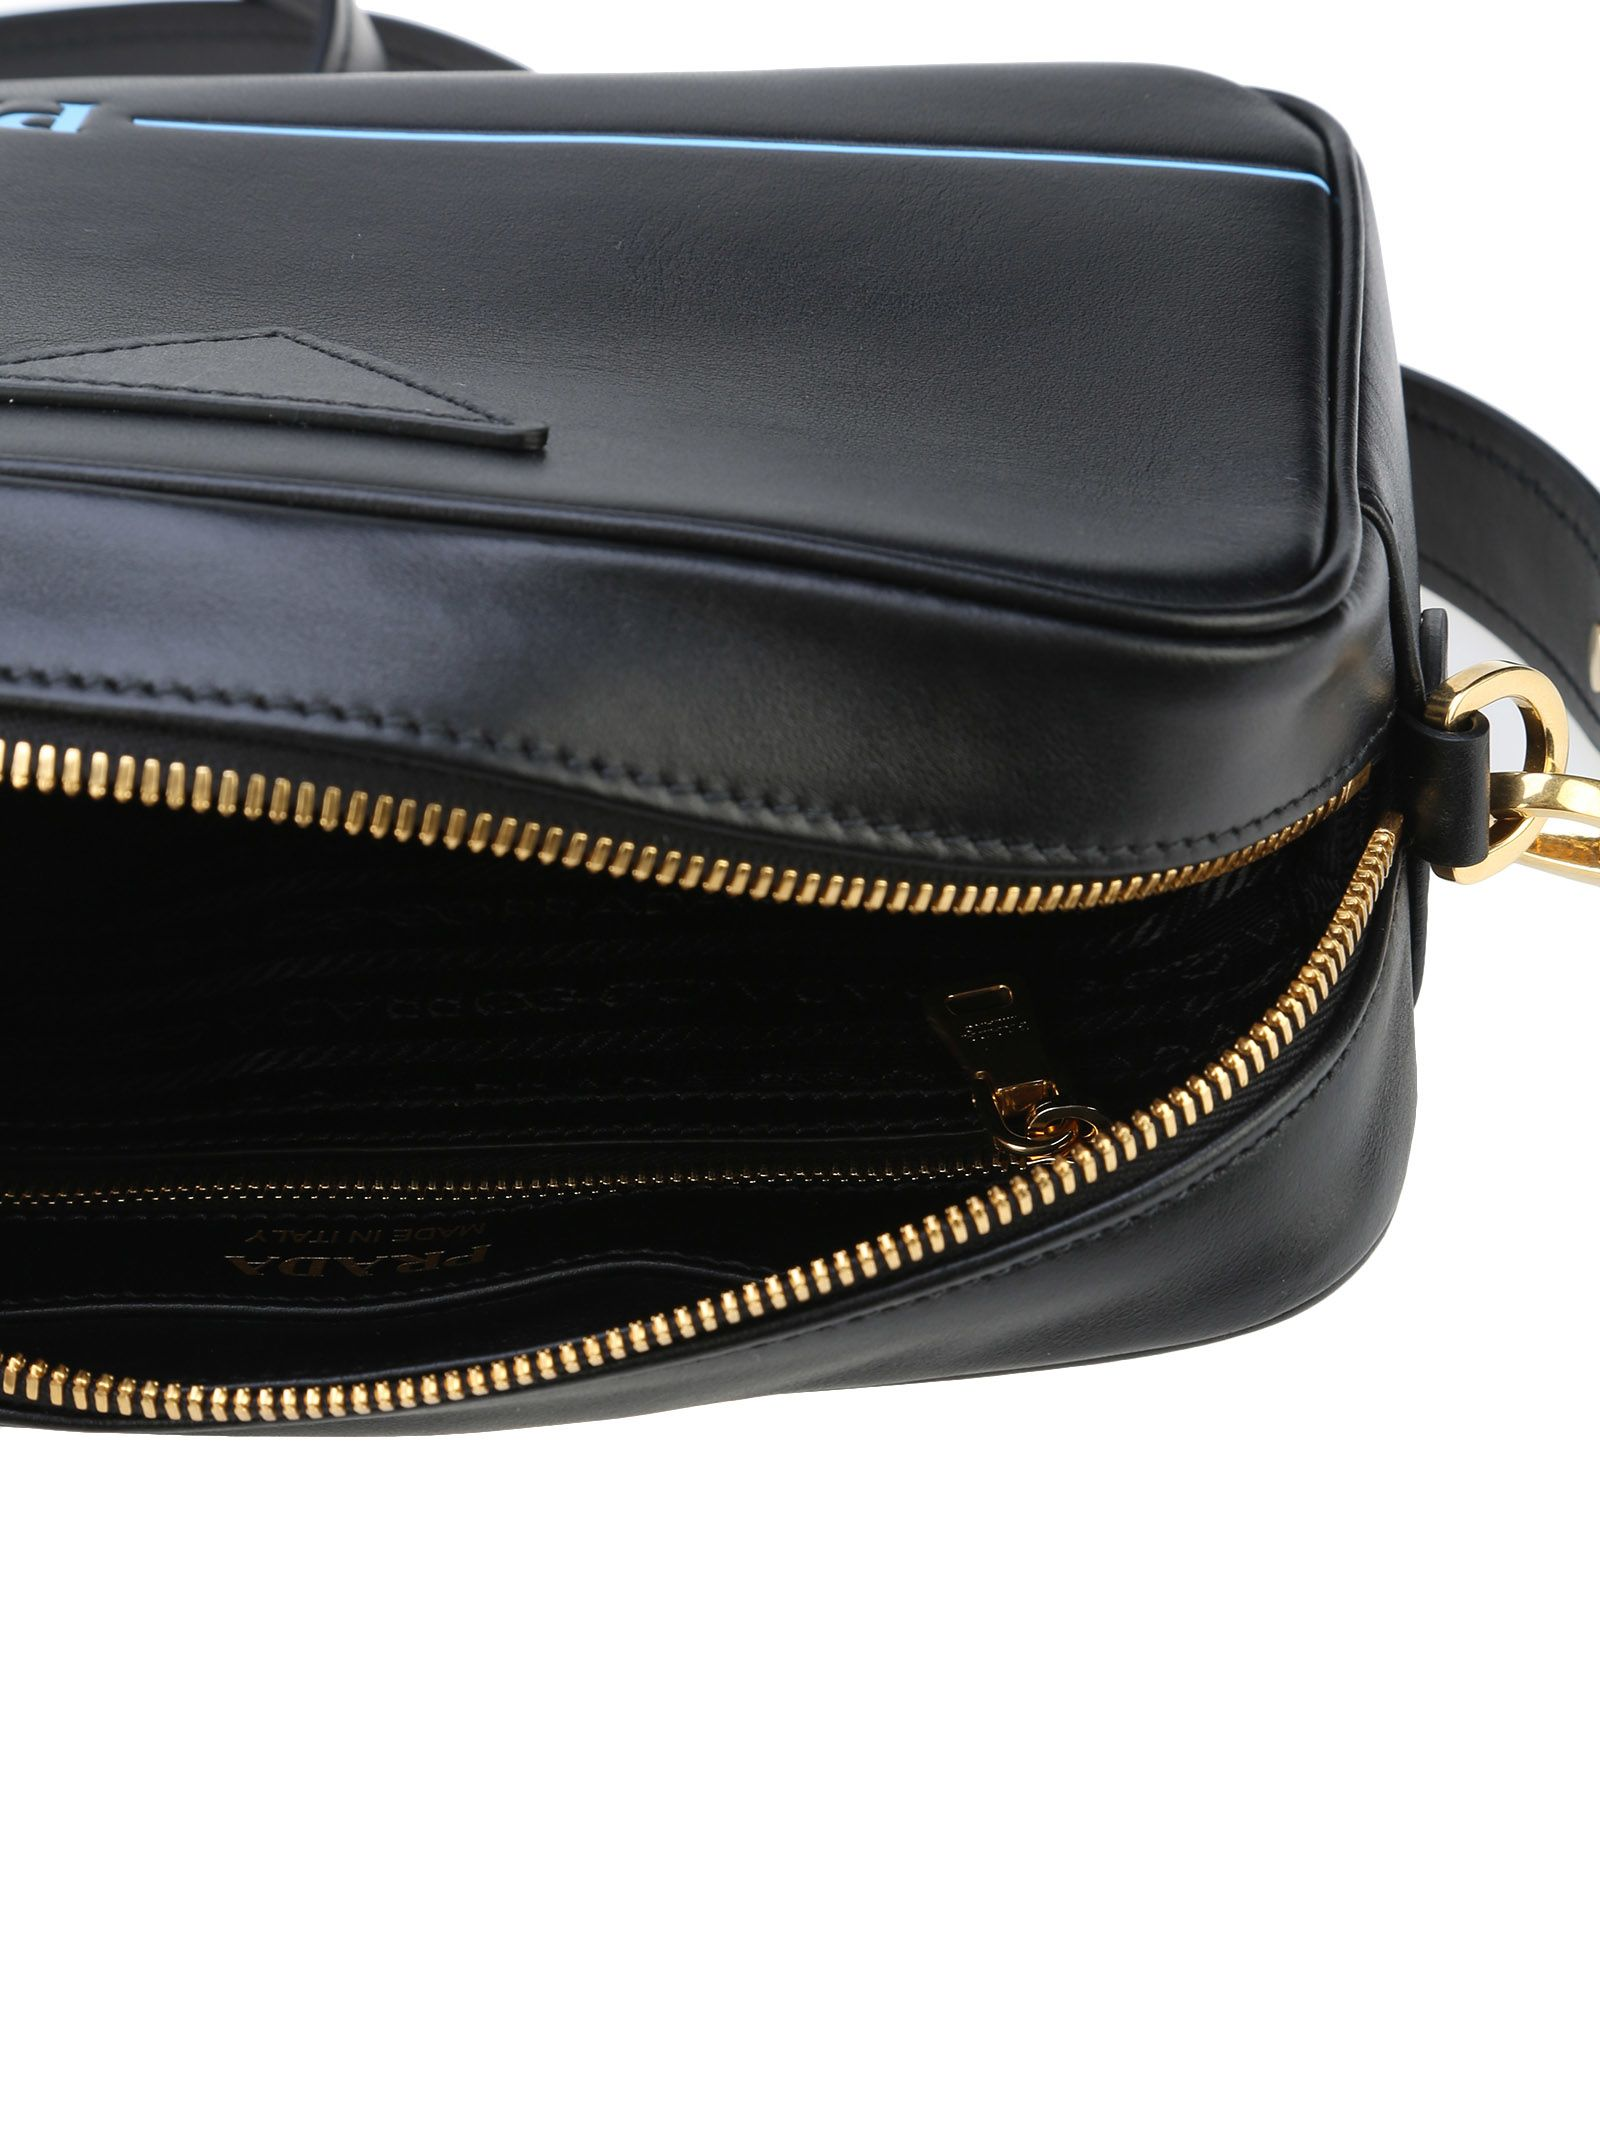 6e87ec2aeda425 Lyst - Prada Cahier Leather Shoulder Bag in Natural italist | Best price in  the market for Prada Prada Mirage Camera Bag - BLACK -